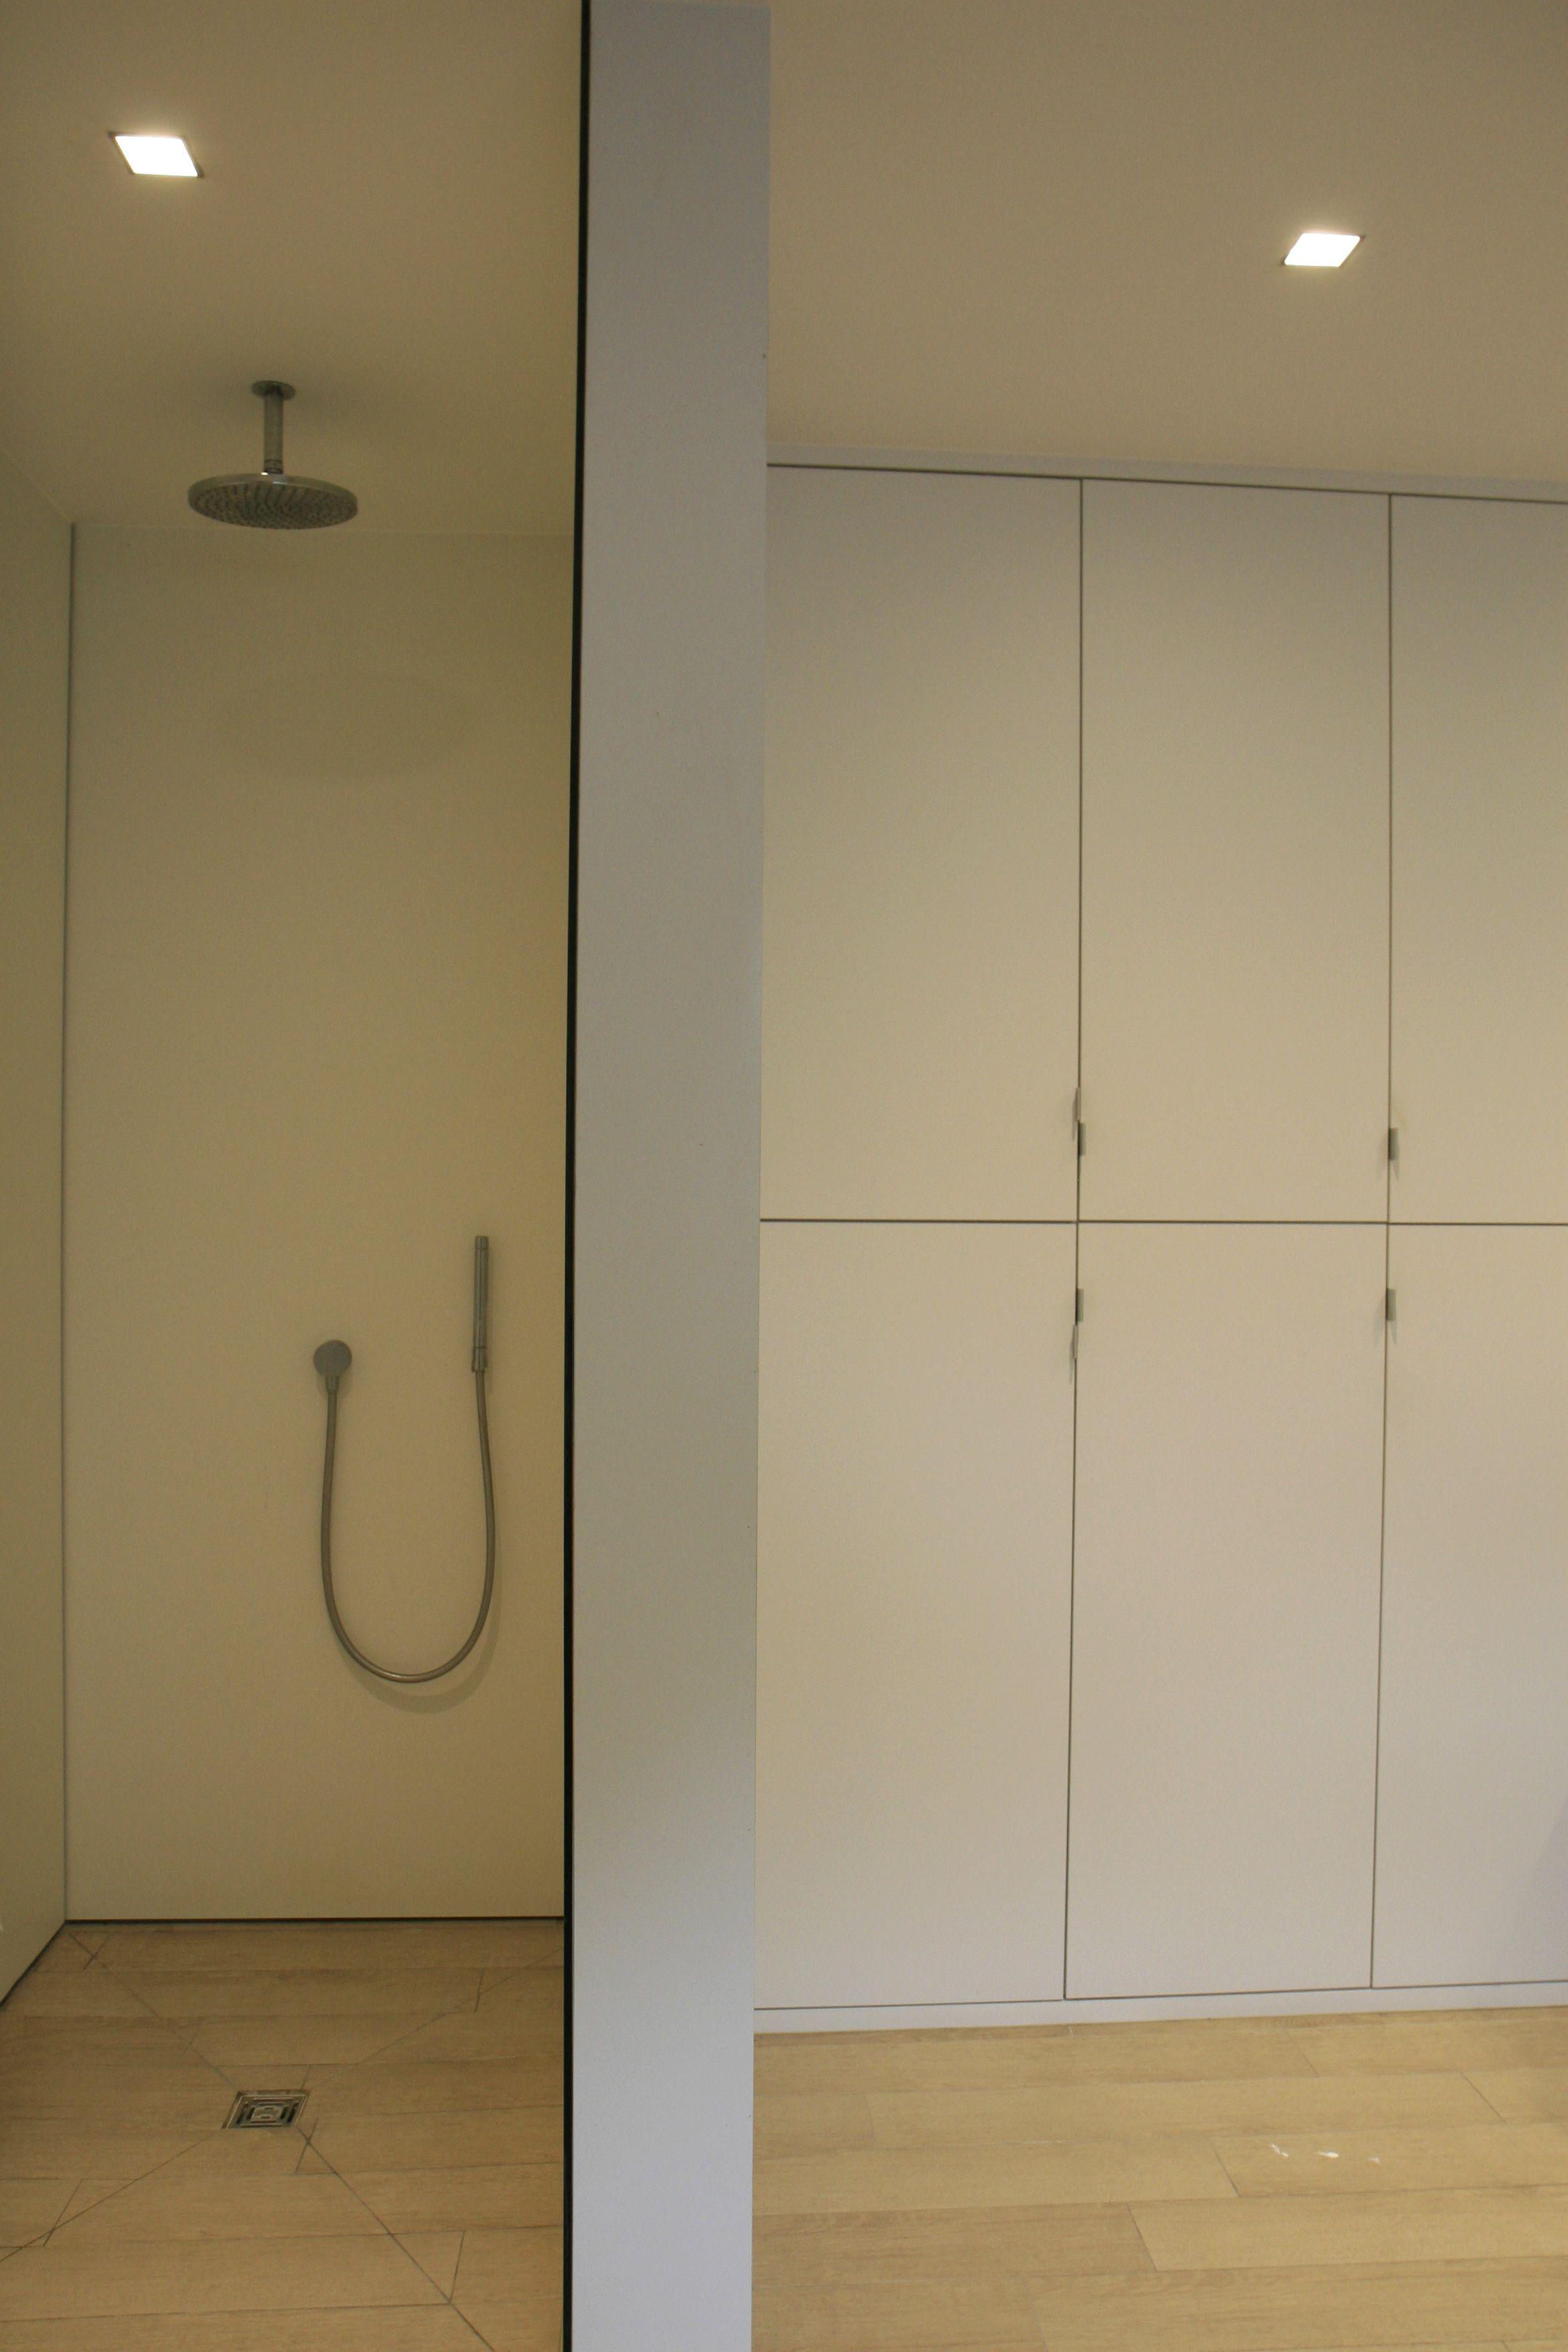 douche in volkern vloer keramische parket | my interior projects ...